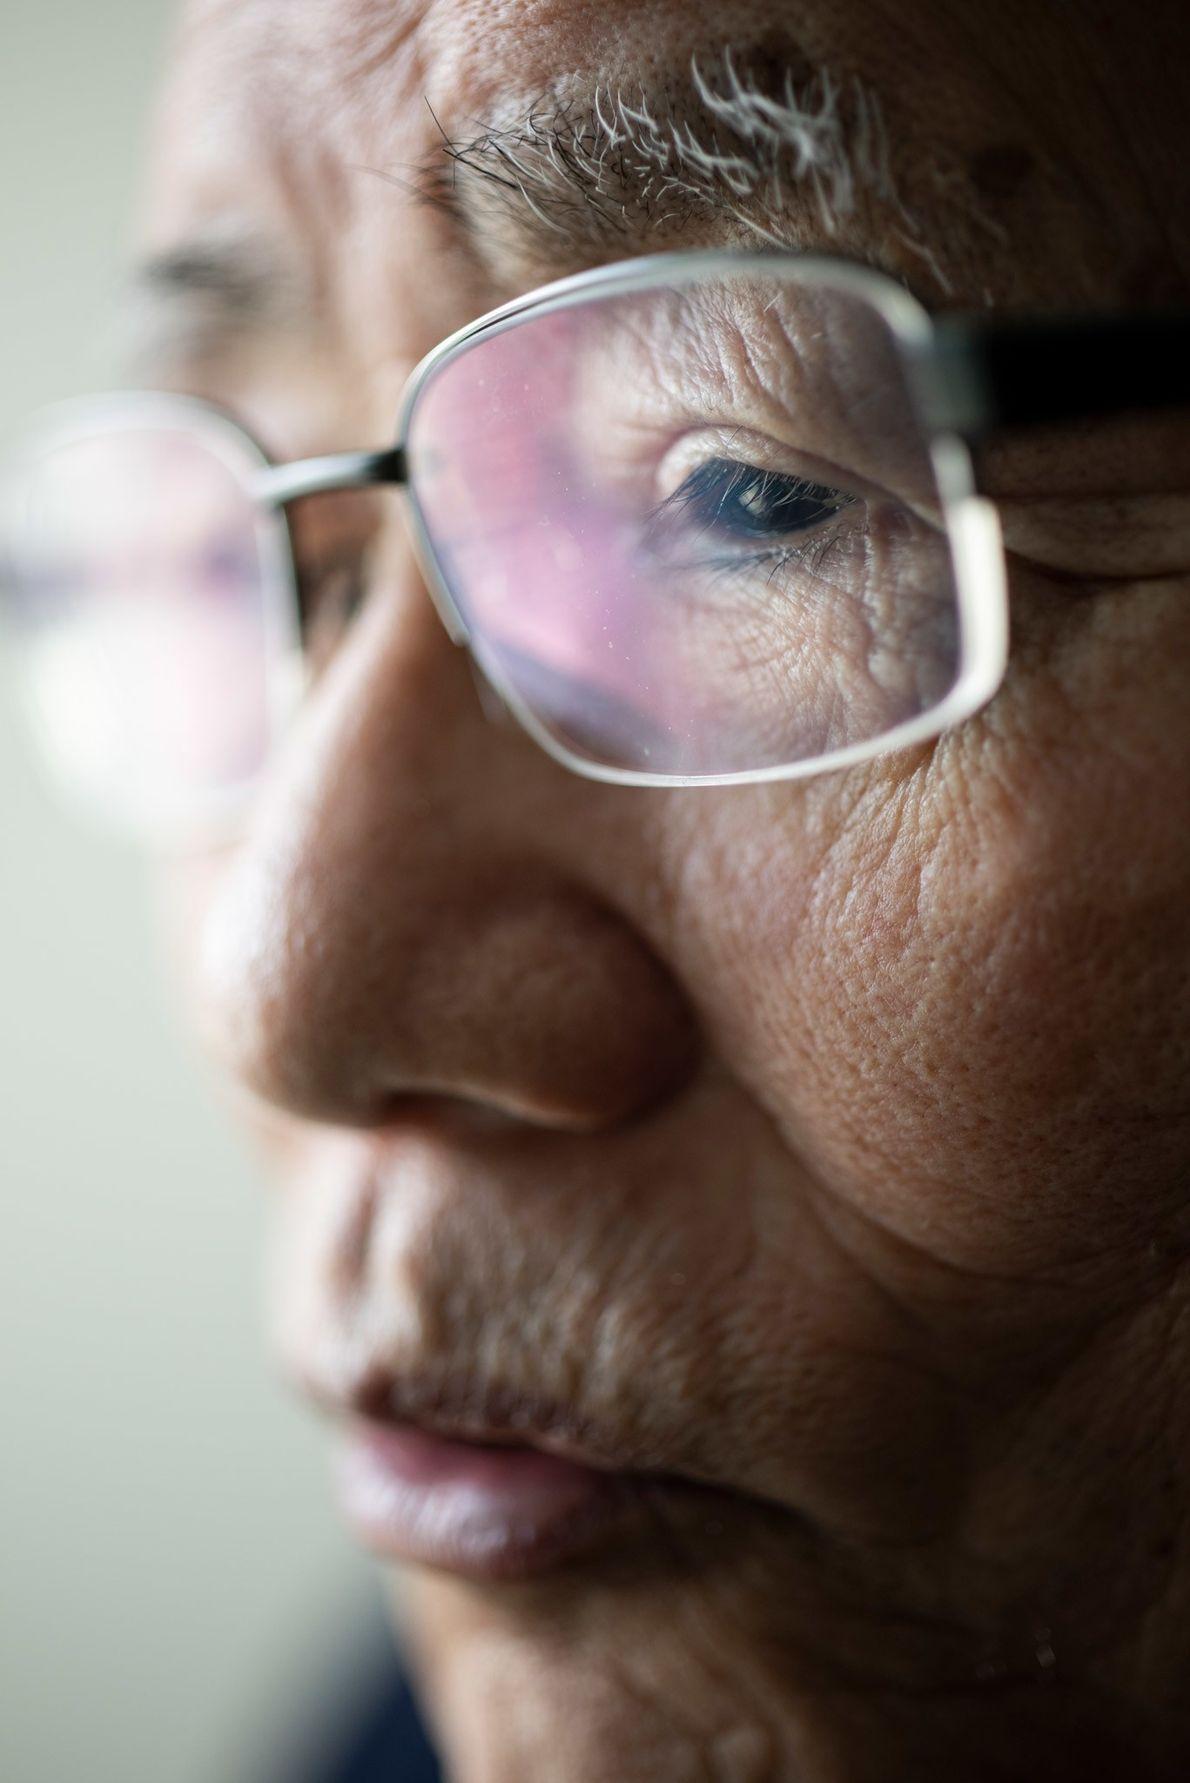 Dr. Nanao Kamada, professor emeritus of radiation biology at Hiroshima University, is one of many unheralded ...